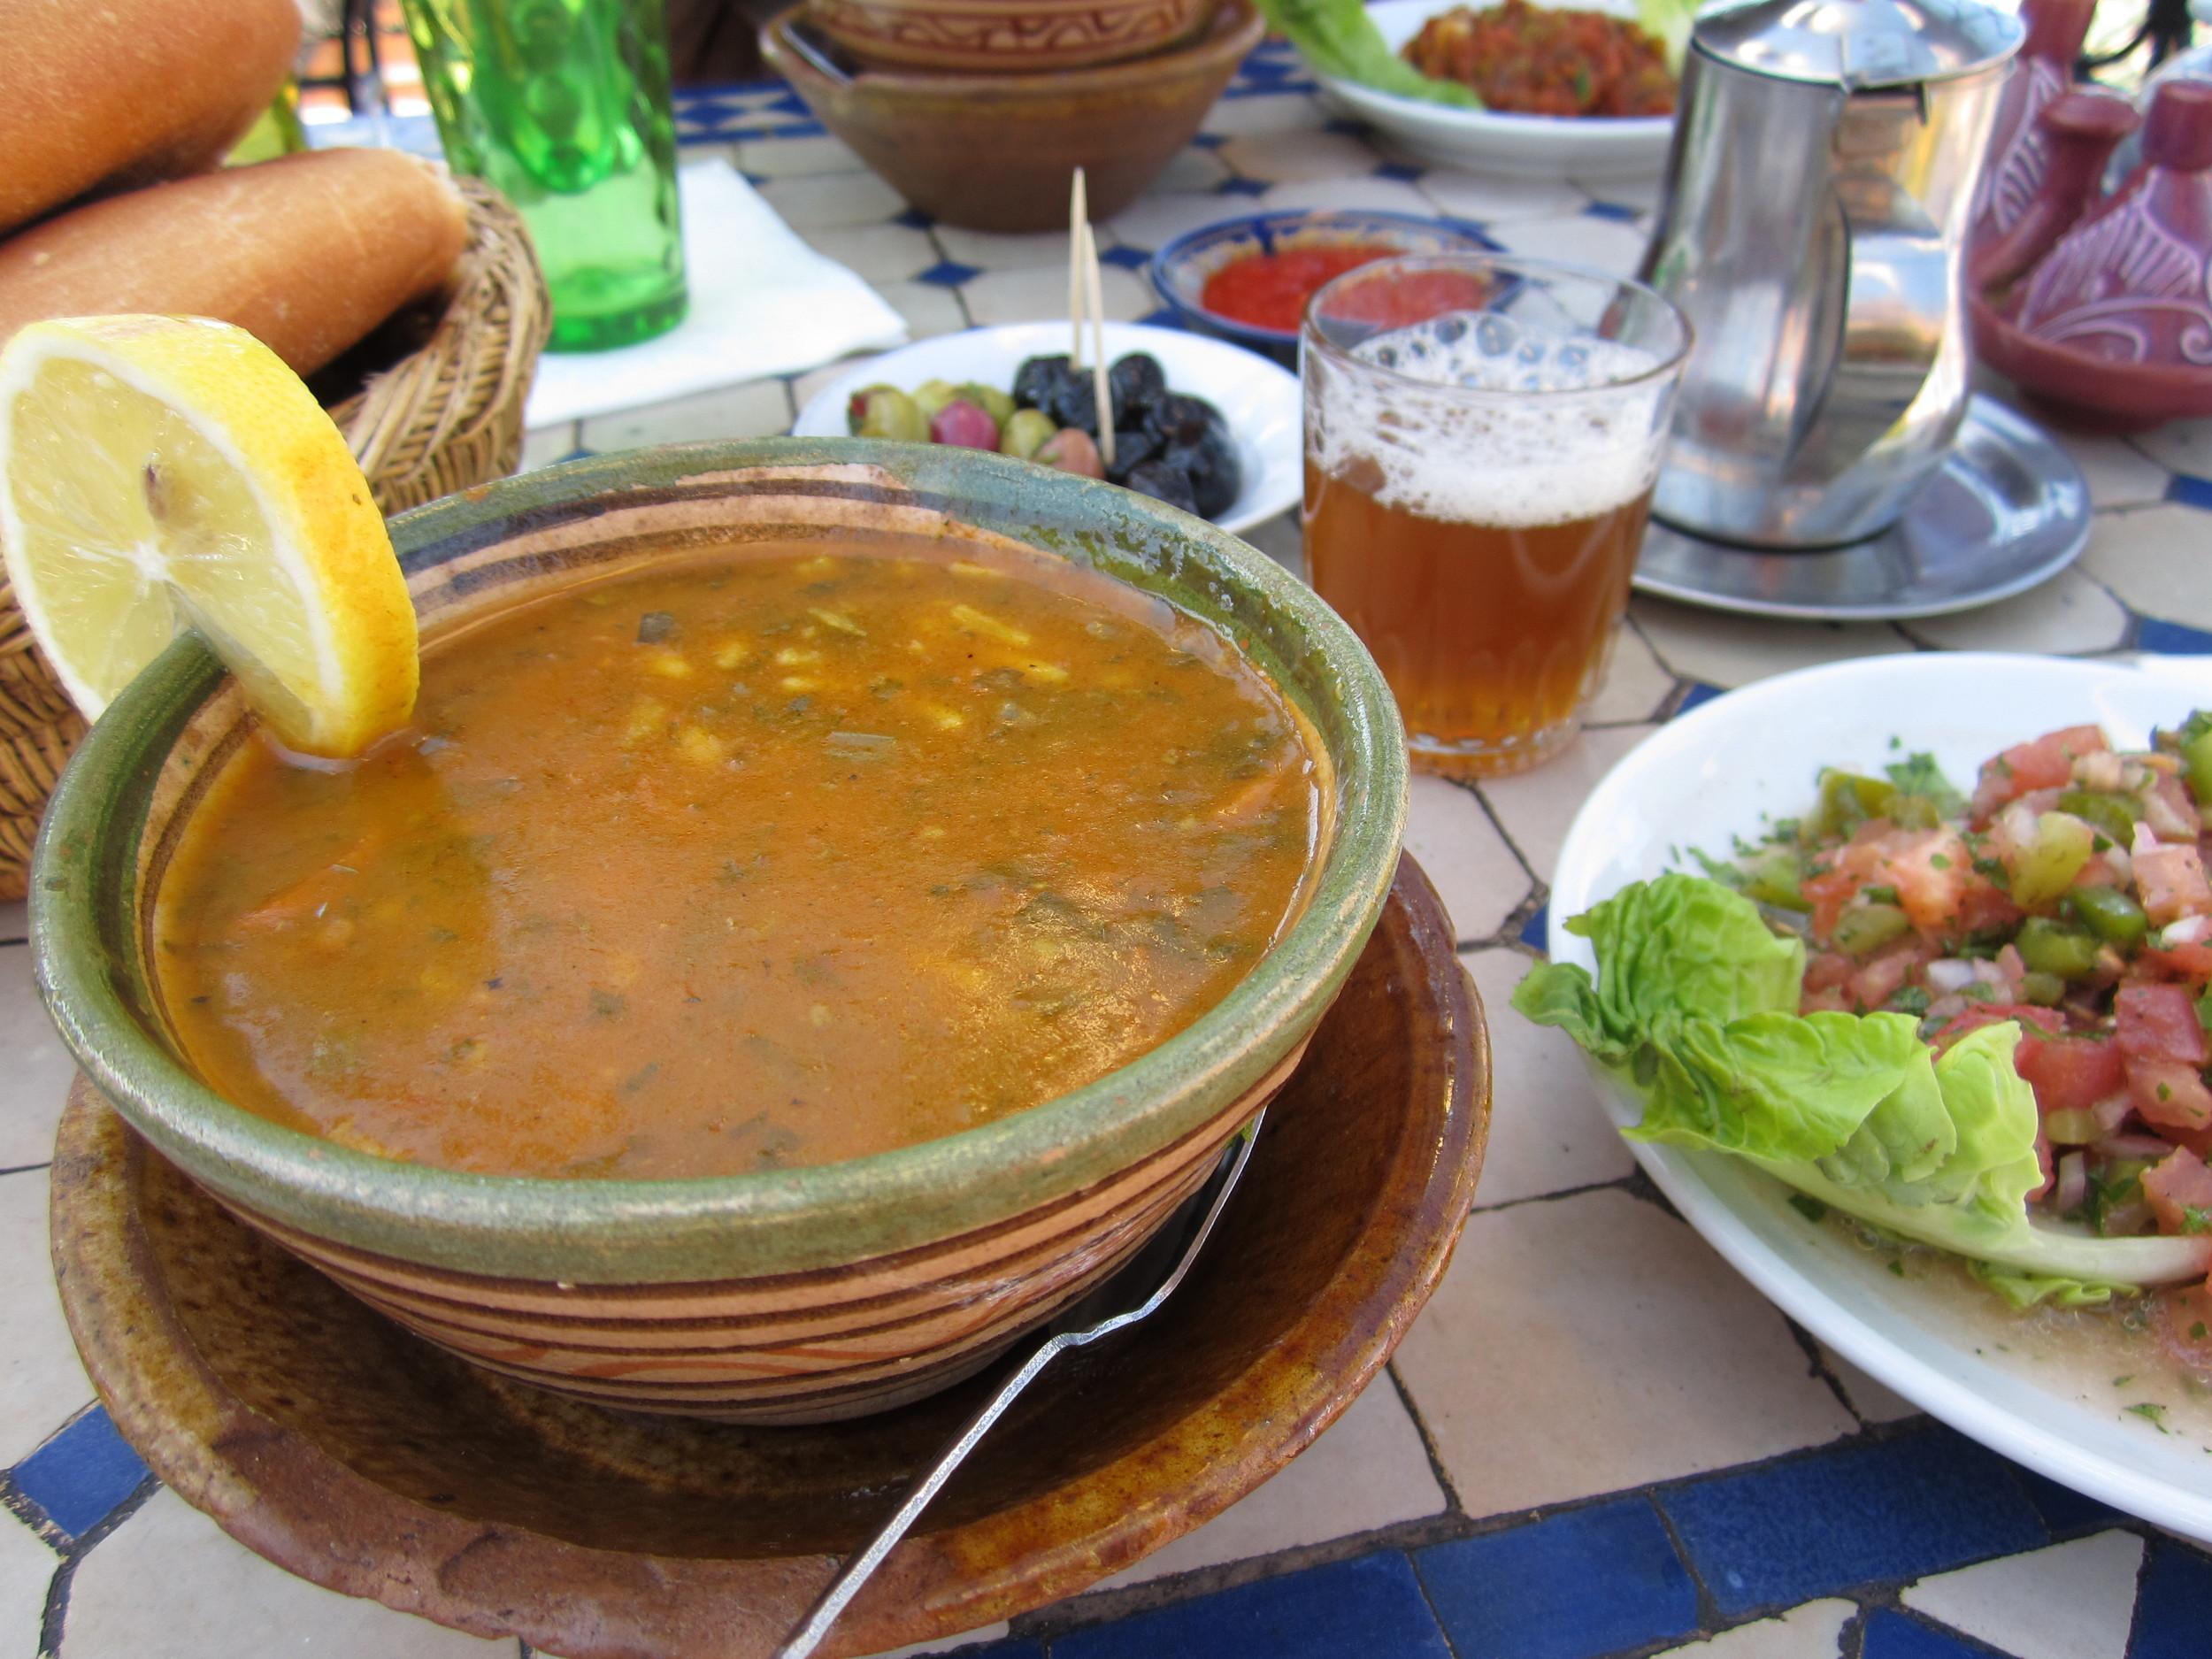 Lentil soup in Marrakech, Morocco